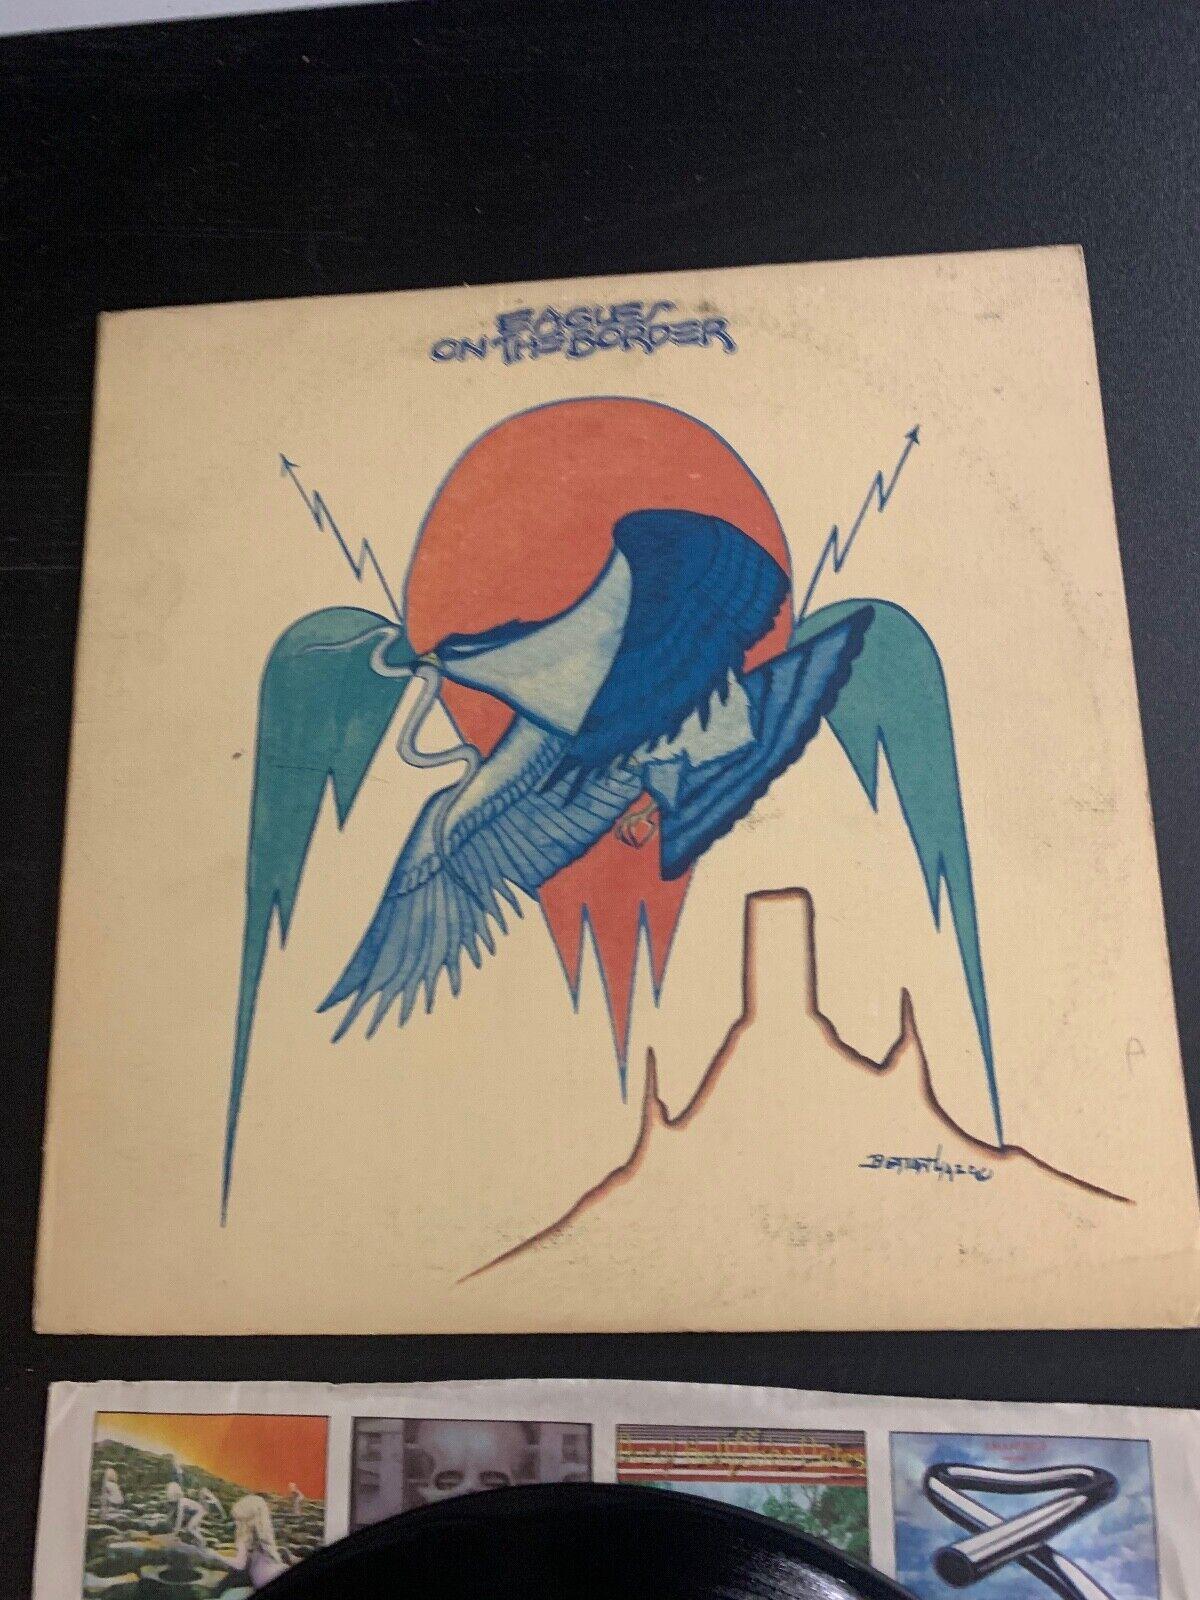 LP RECORD - The Eagles - On The Border - ASYLUM RECORDS - $9.99